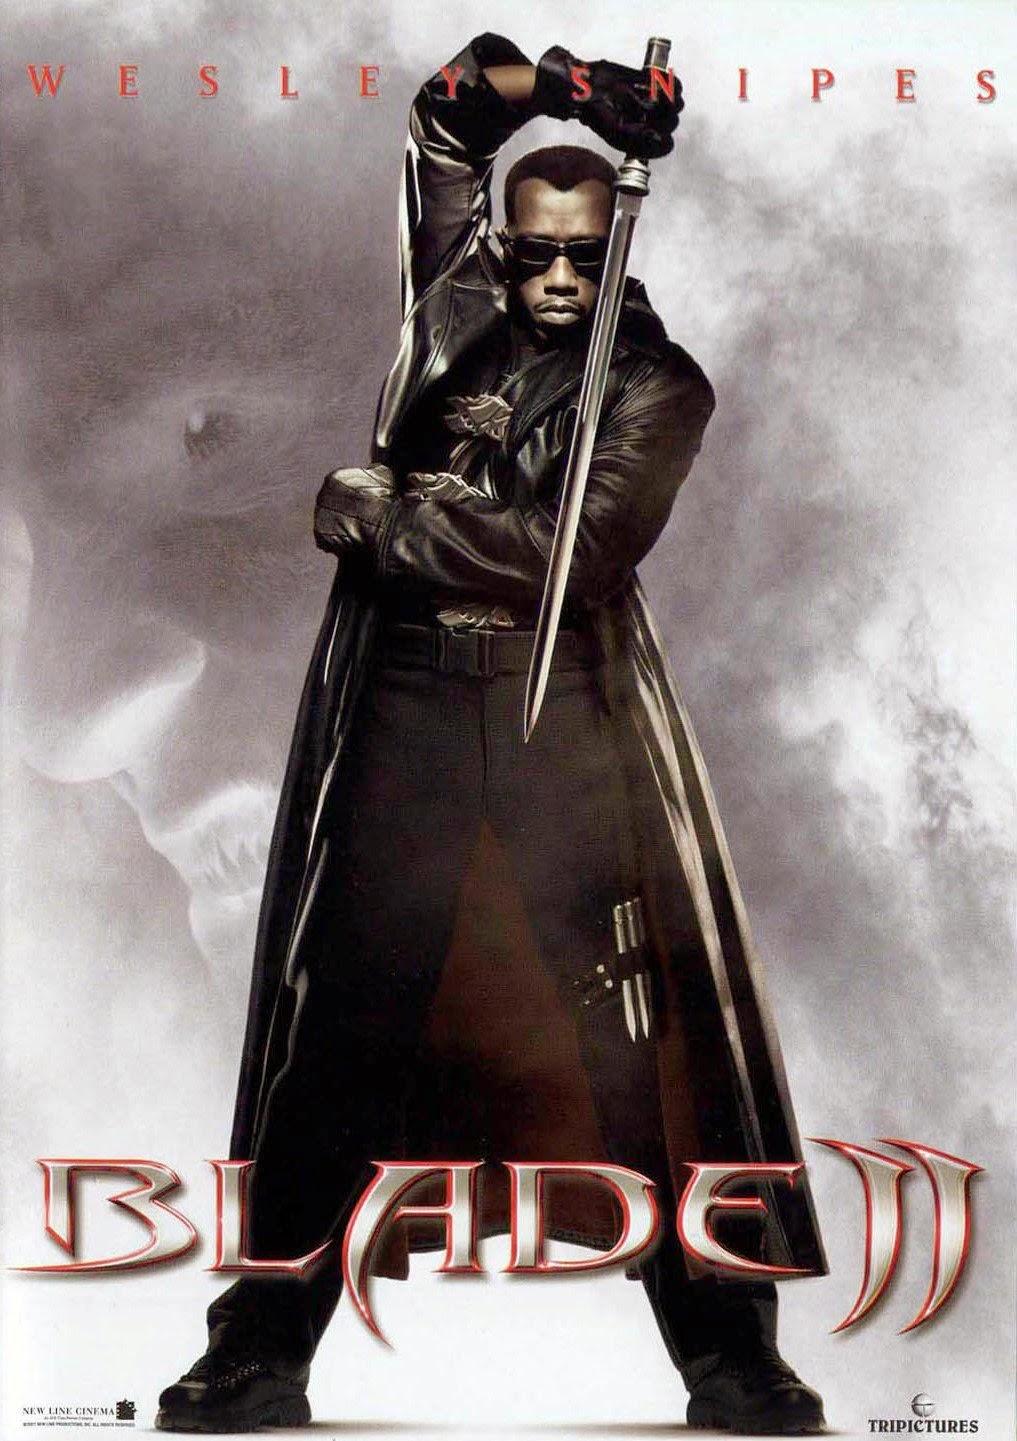 Blade 2 นักล่าพันธุ์อมตะ 2 [HD][พากย์ไทย]